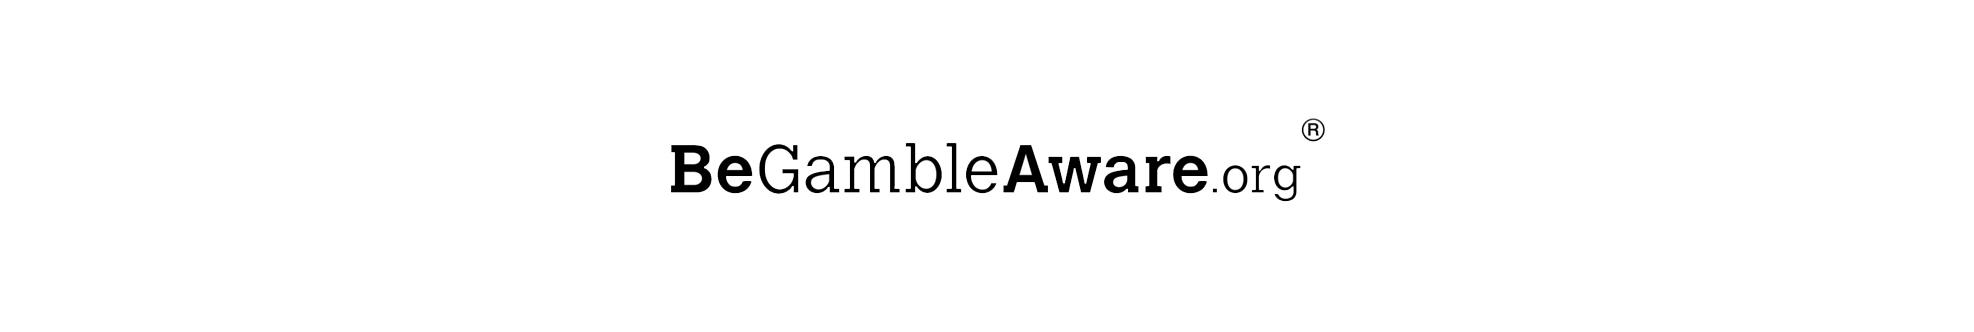 BeGambleAware_logo_0819_2.jpg?mtime=20190826100648#asset:321796